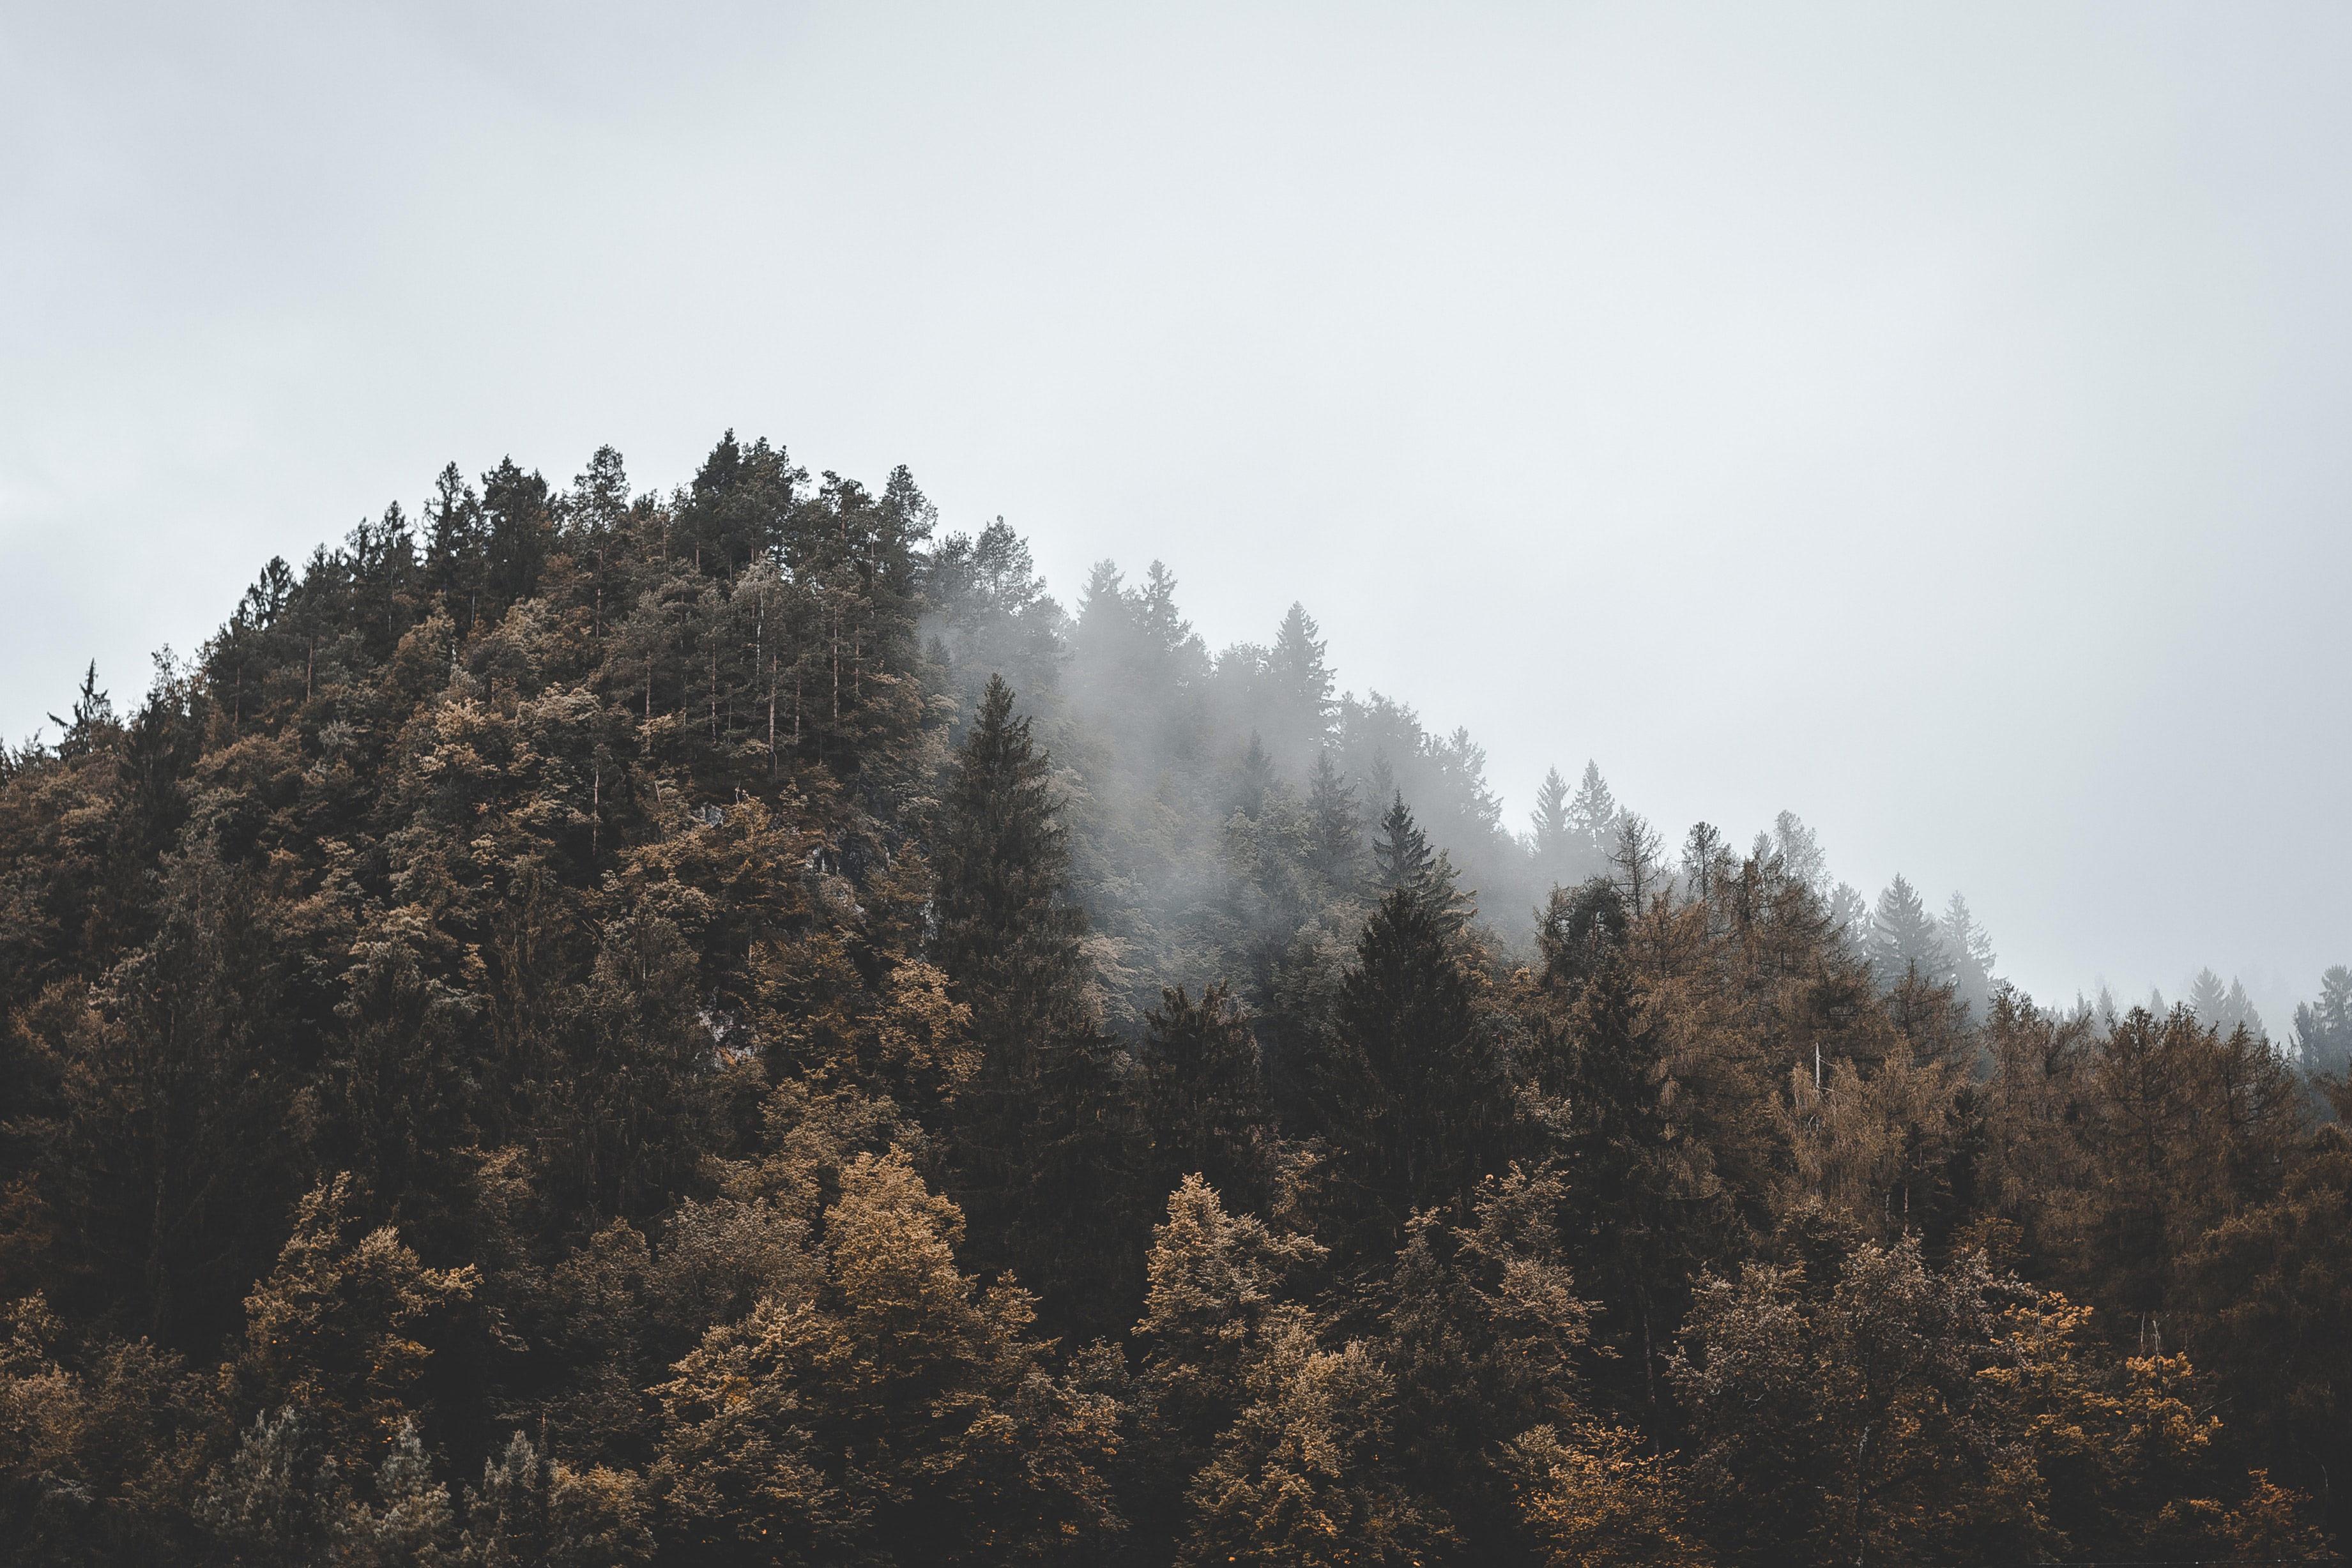 Foggy Mountain by Florian van Duyn for Conscious by Chloé